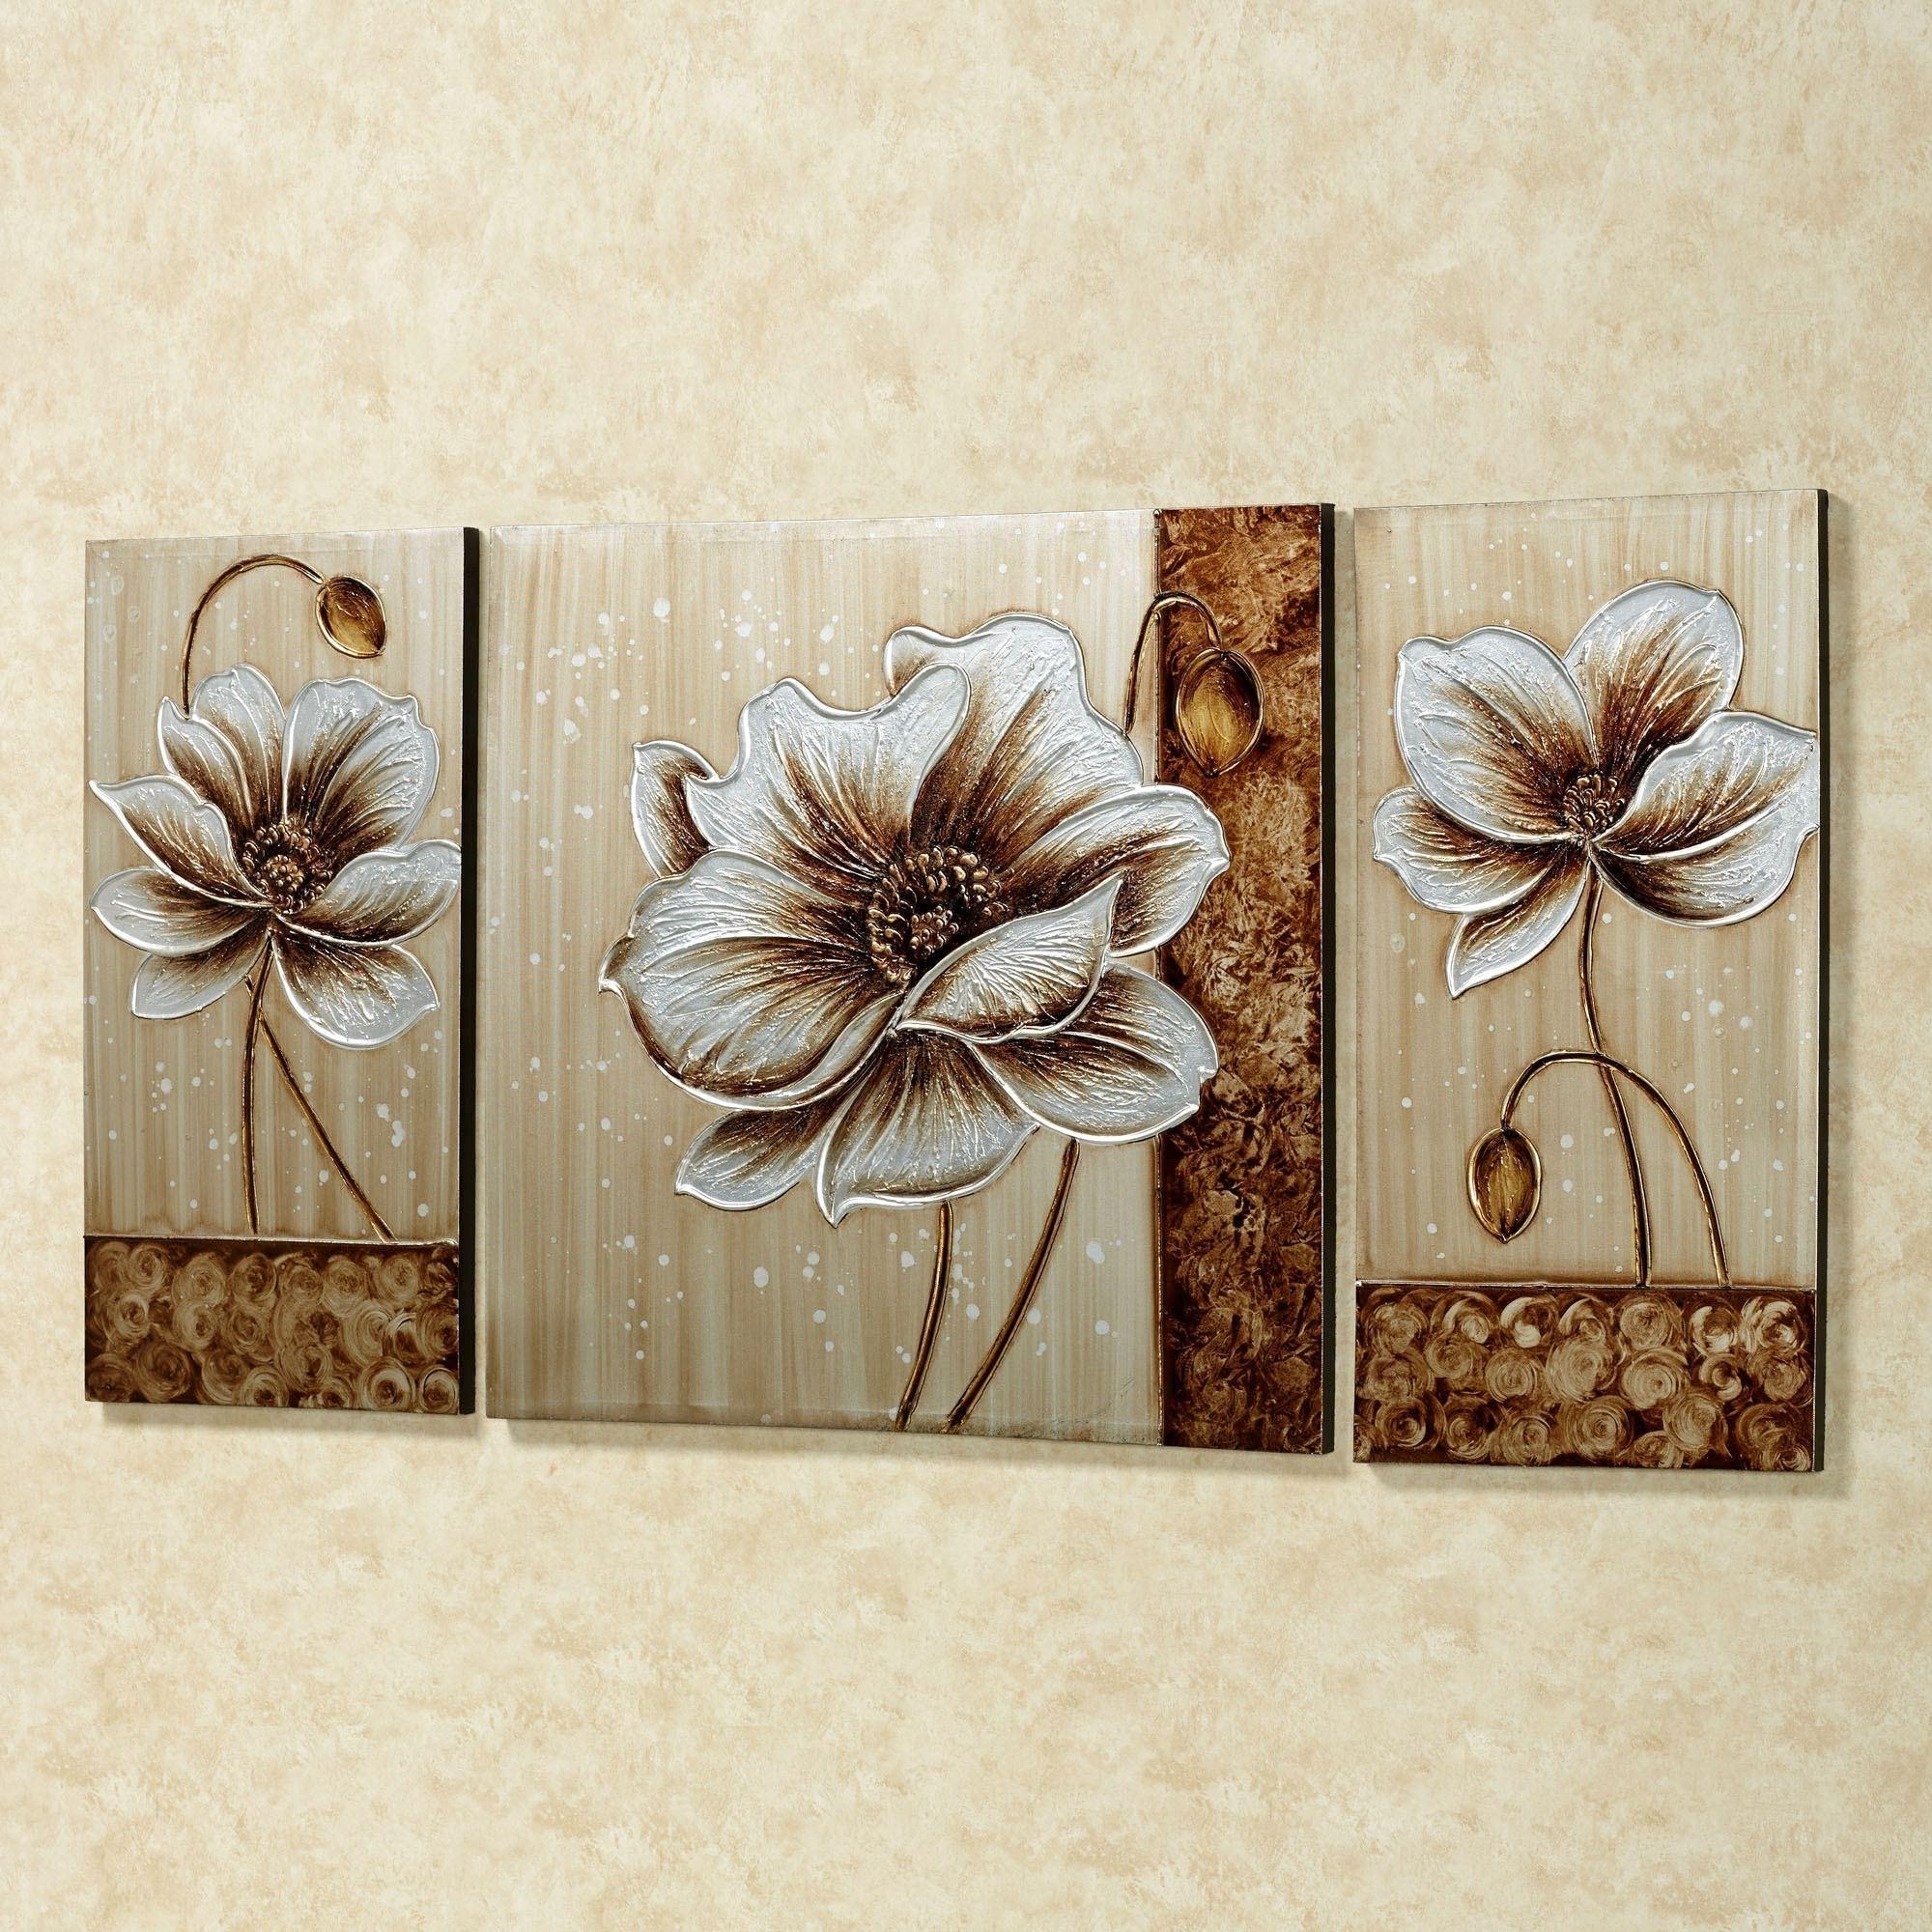 Subtle Elegance Floral Canvas Wall Art Set Inside Recent Wall Art Sets (View 5 of 15)